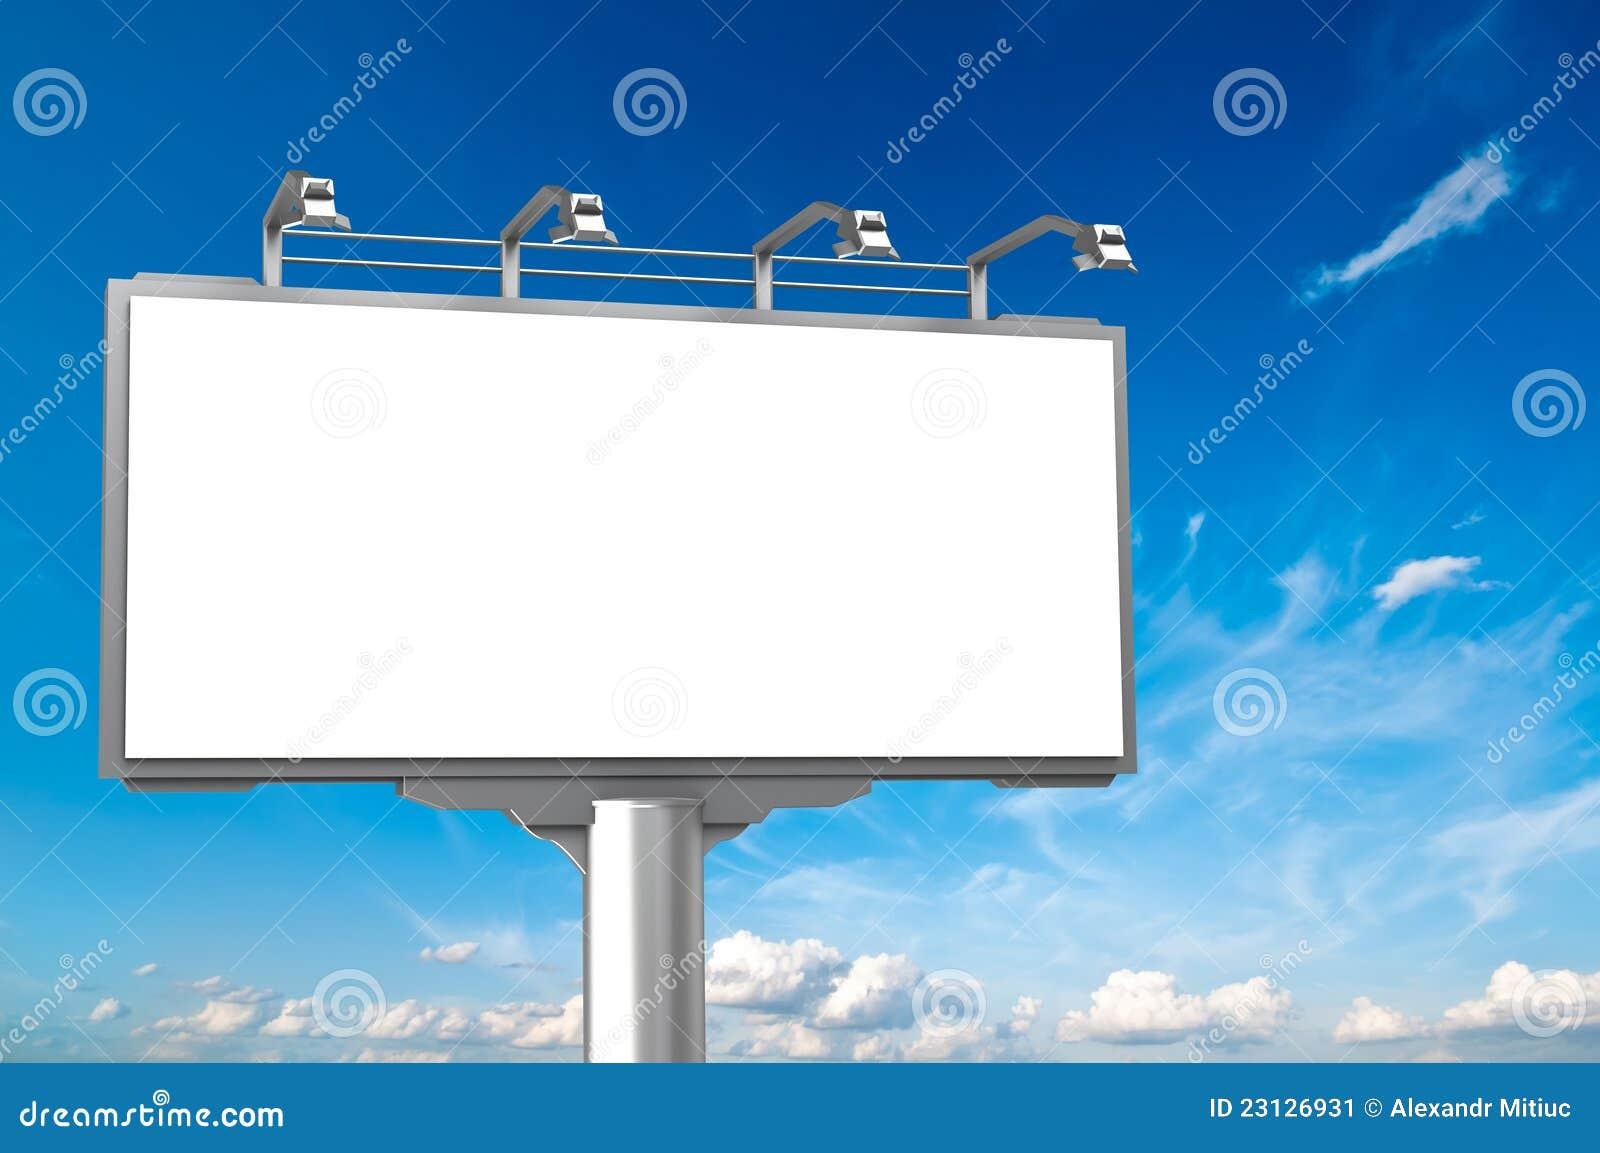 Hoarding business plan